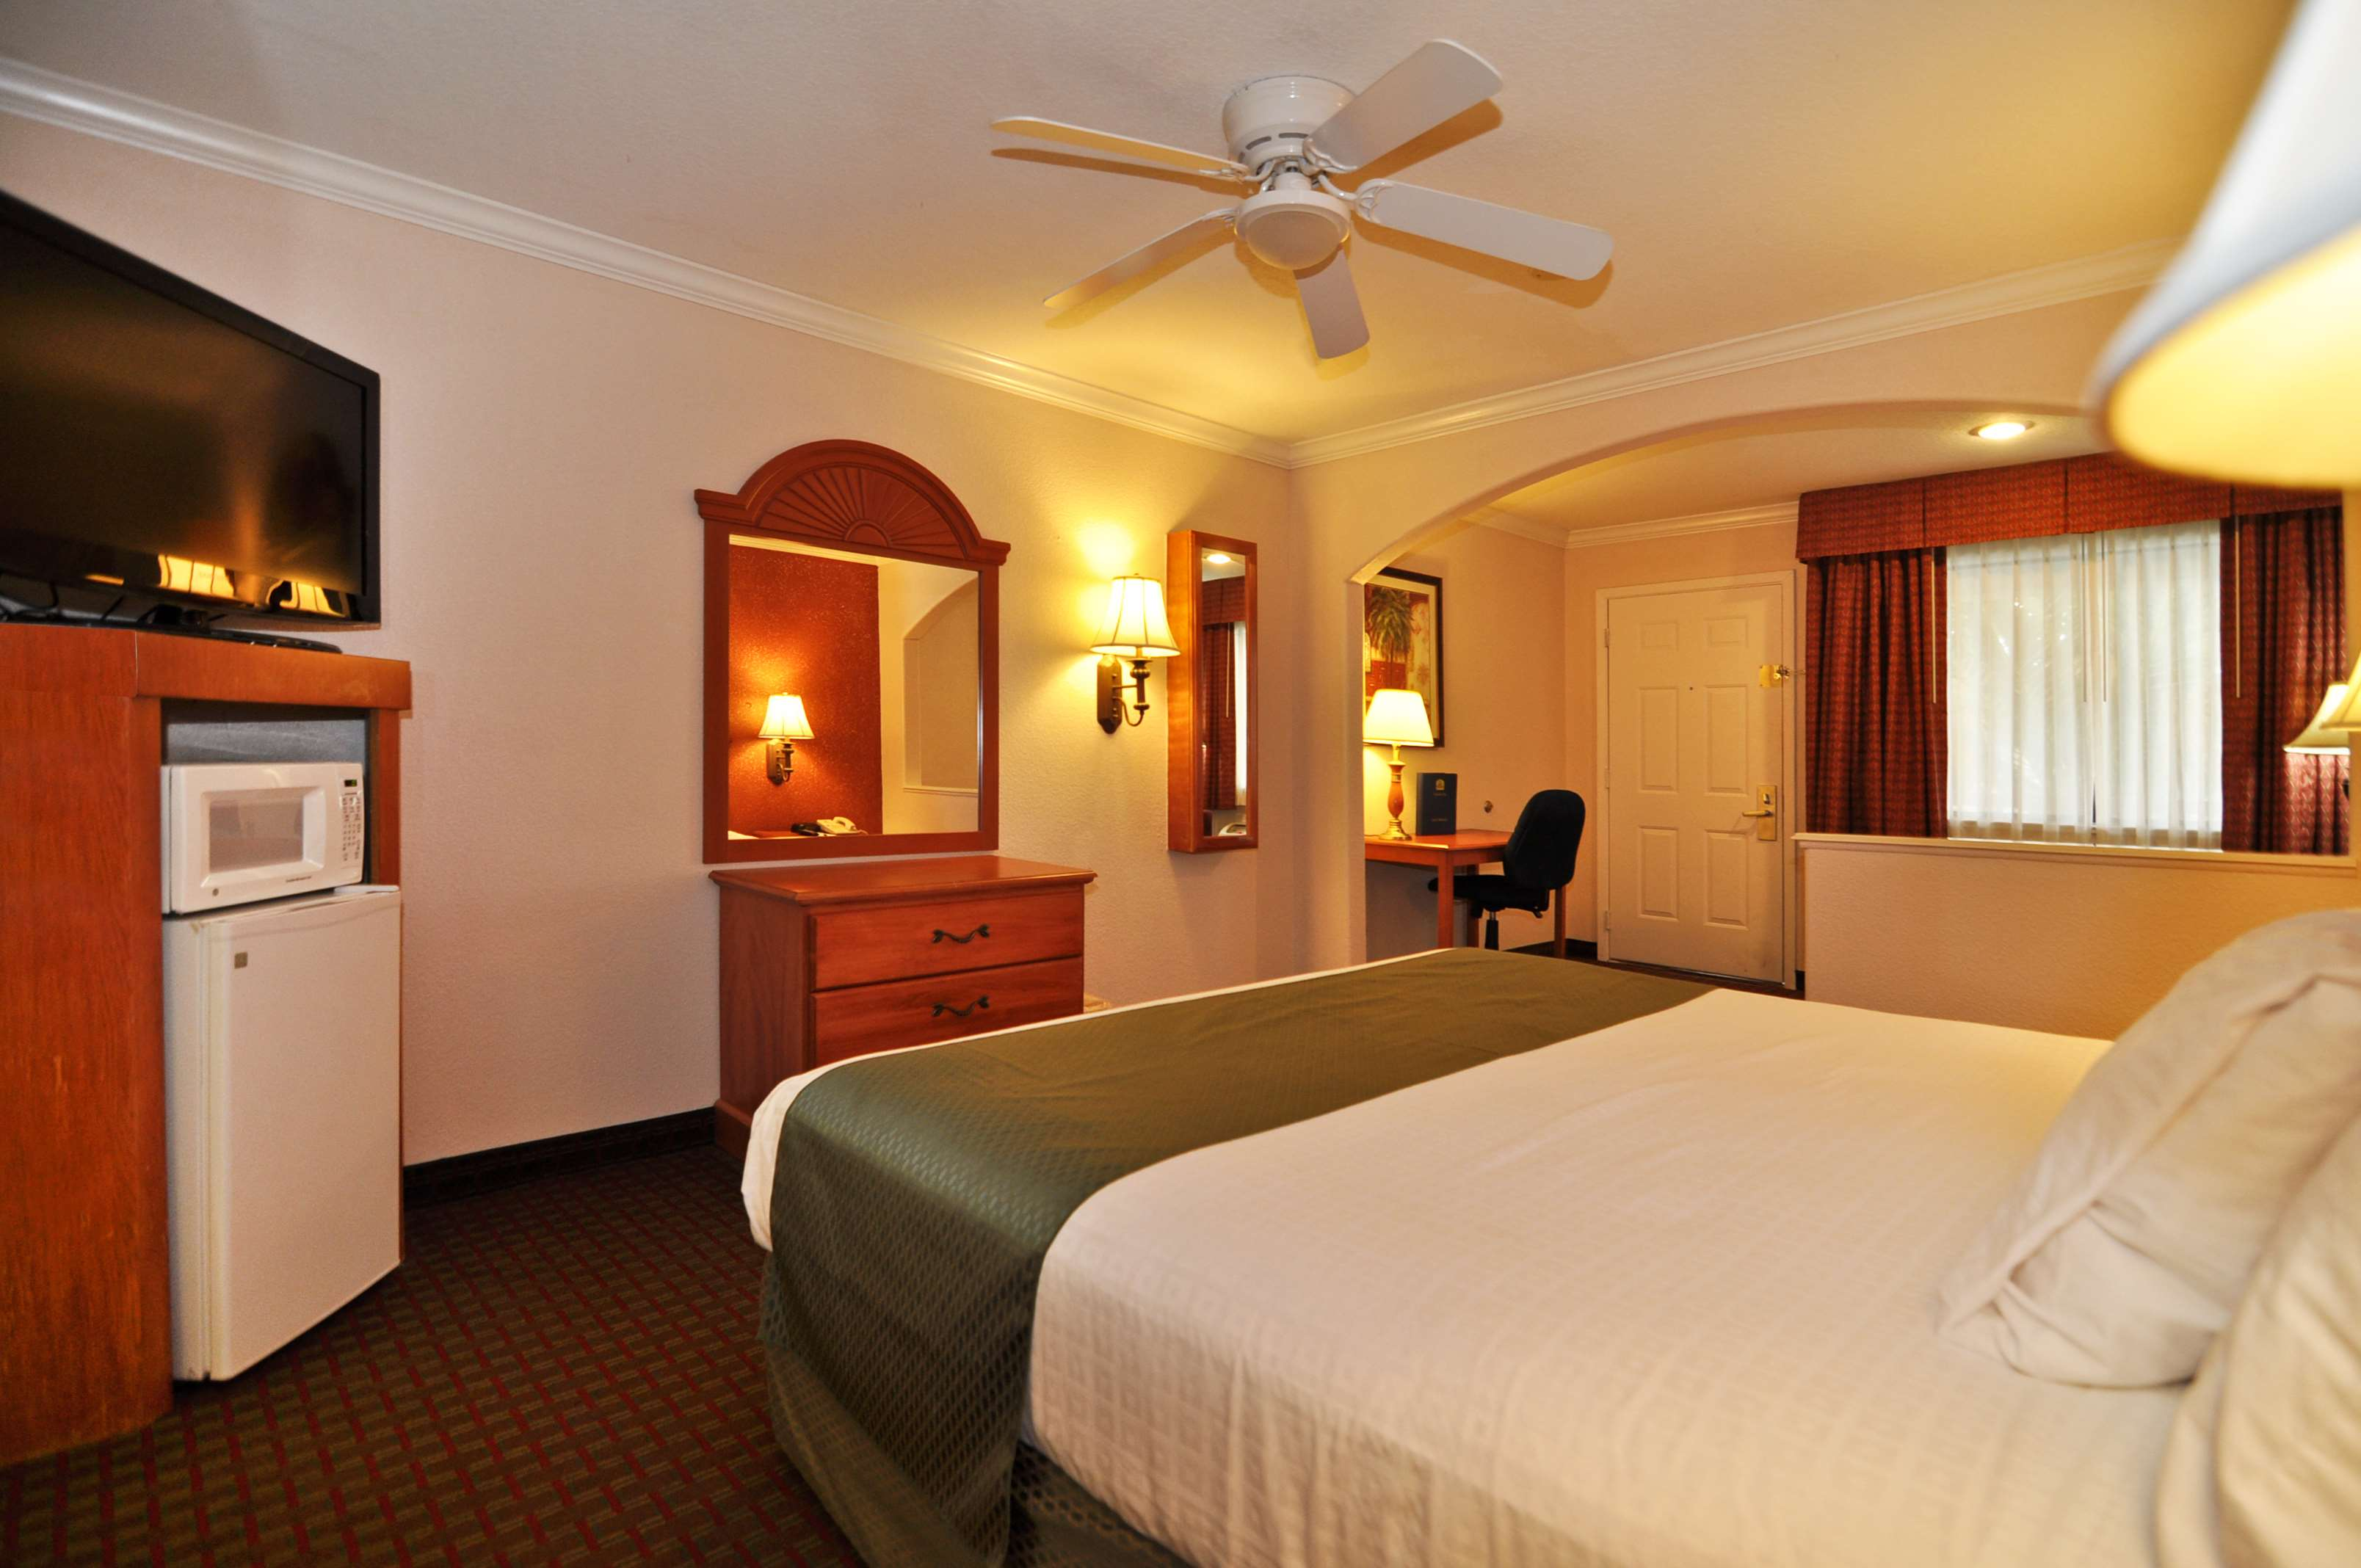 Best Western Pearland Inn image 6